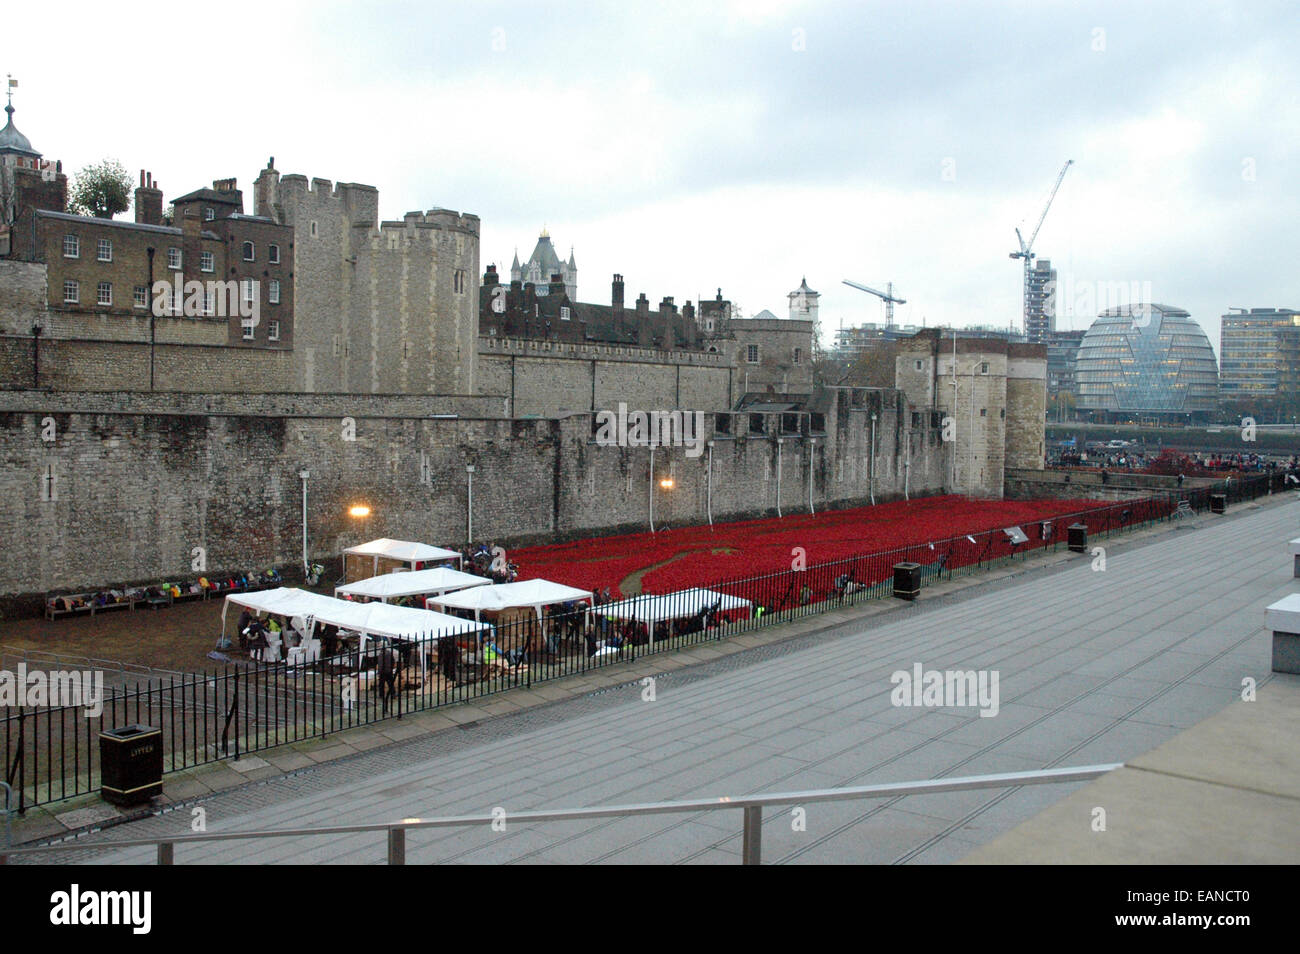 London UK Th Nov Poppies Removal Progresses At Tower Of - Tower of london river of poppies